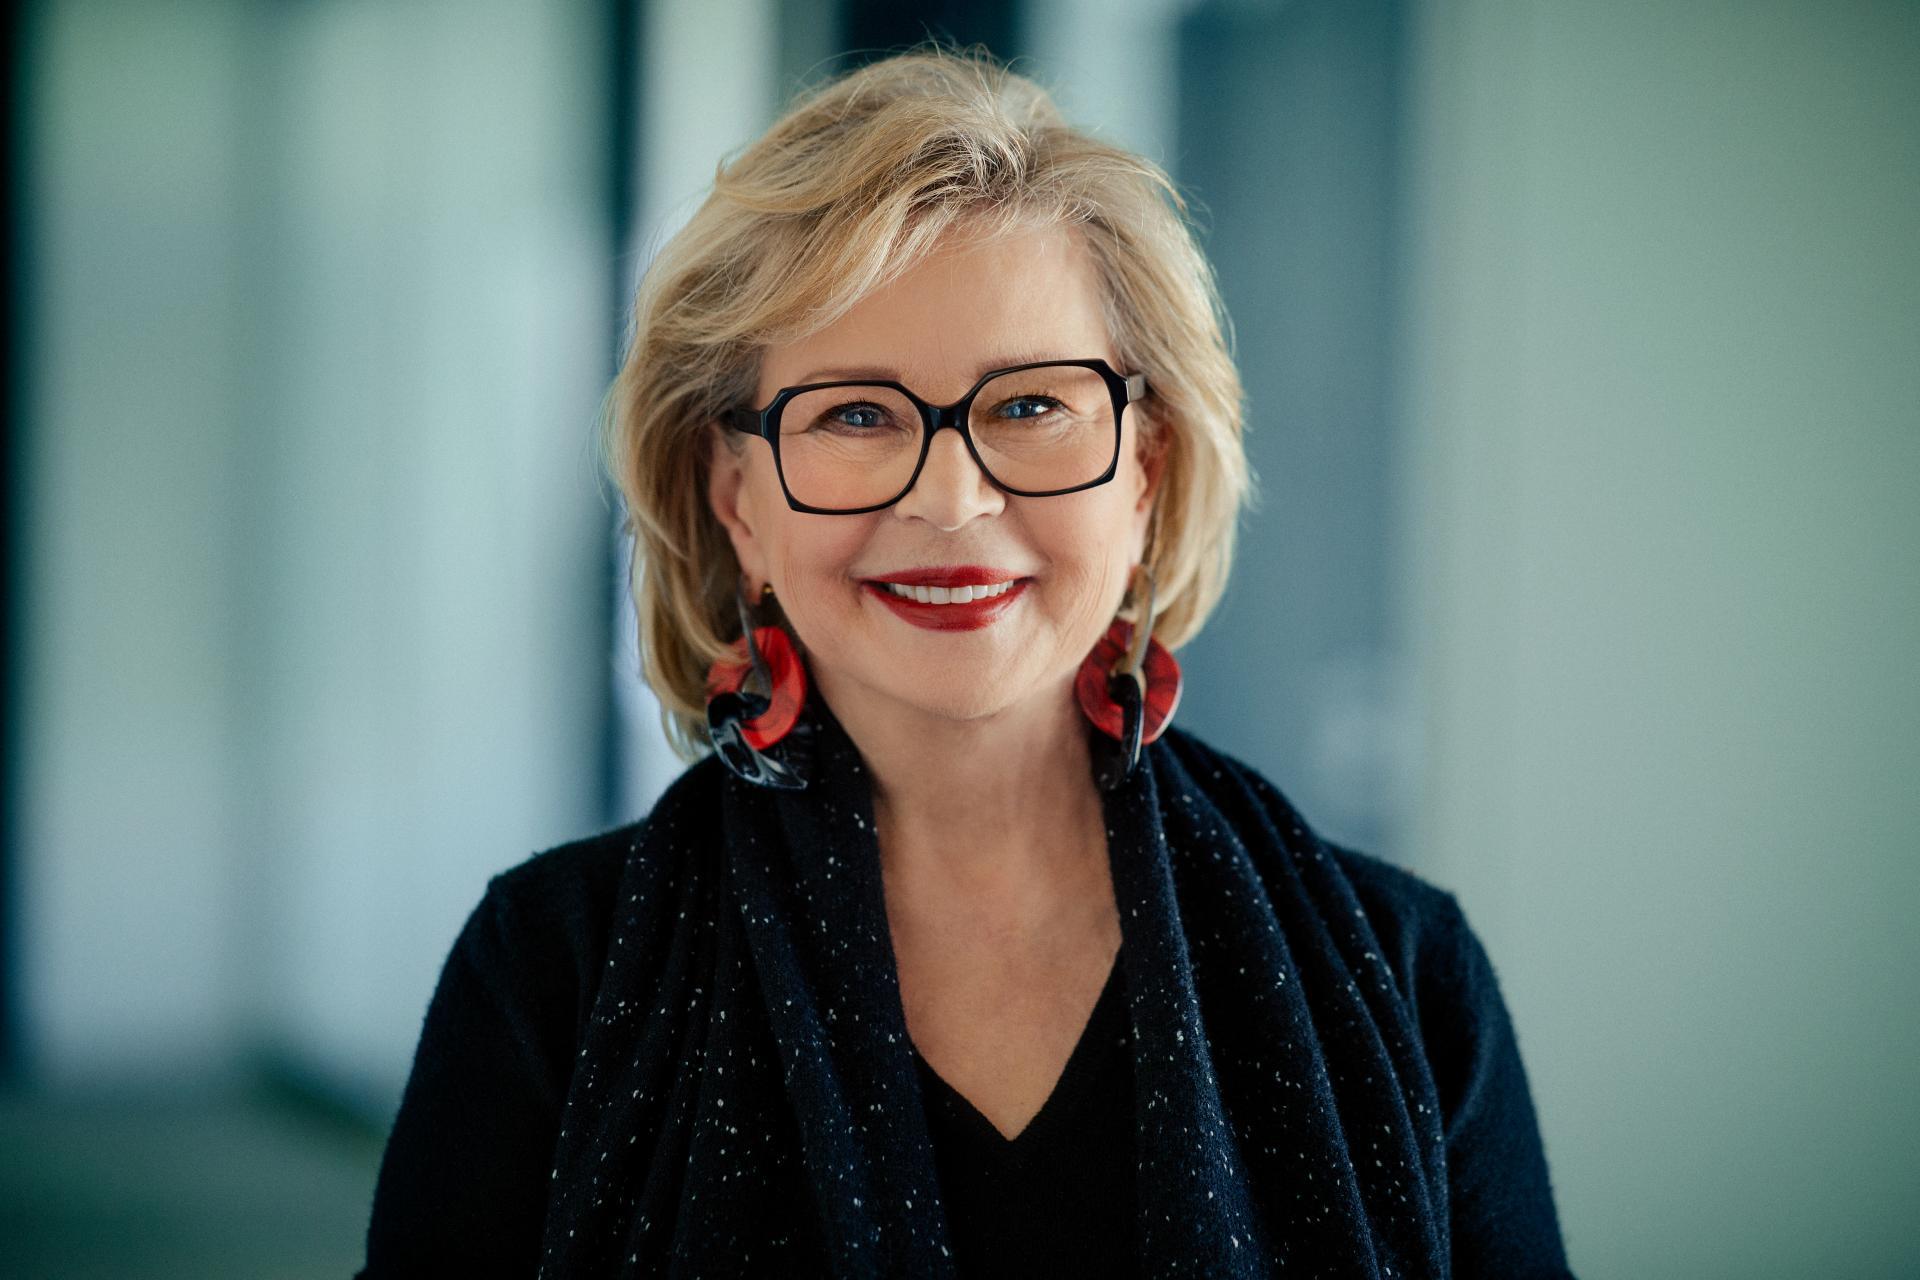 Dr. Margot Gräfin von Westerholt - Rechtsanwältin Of Counsel